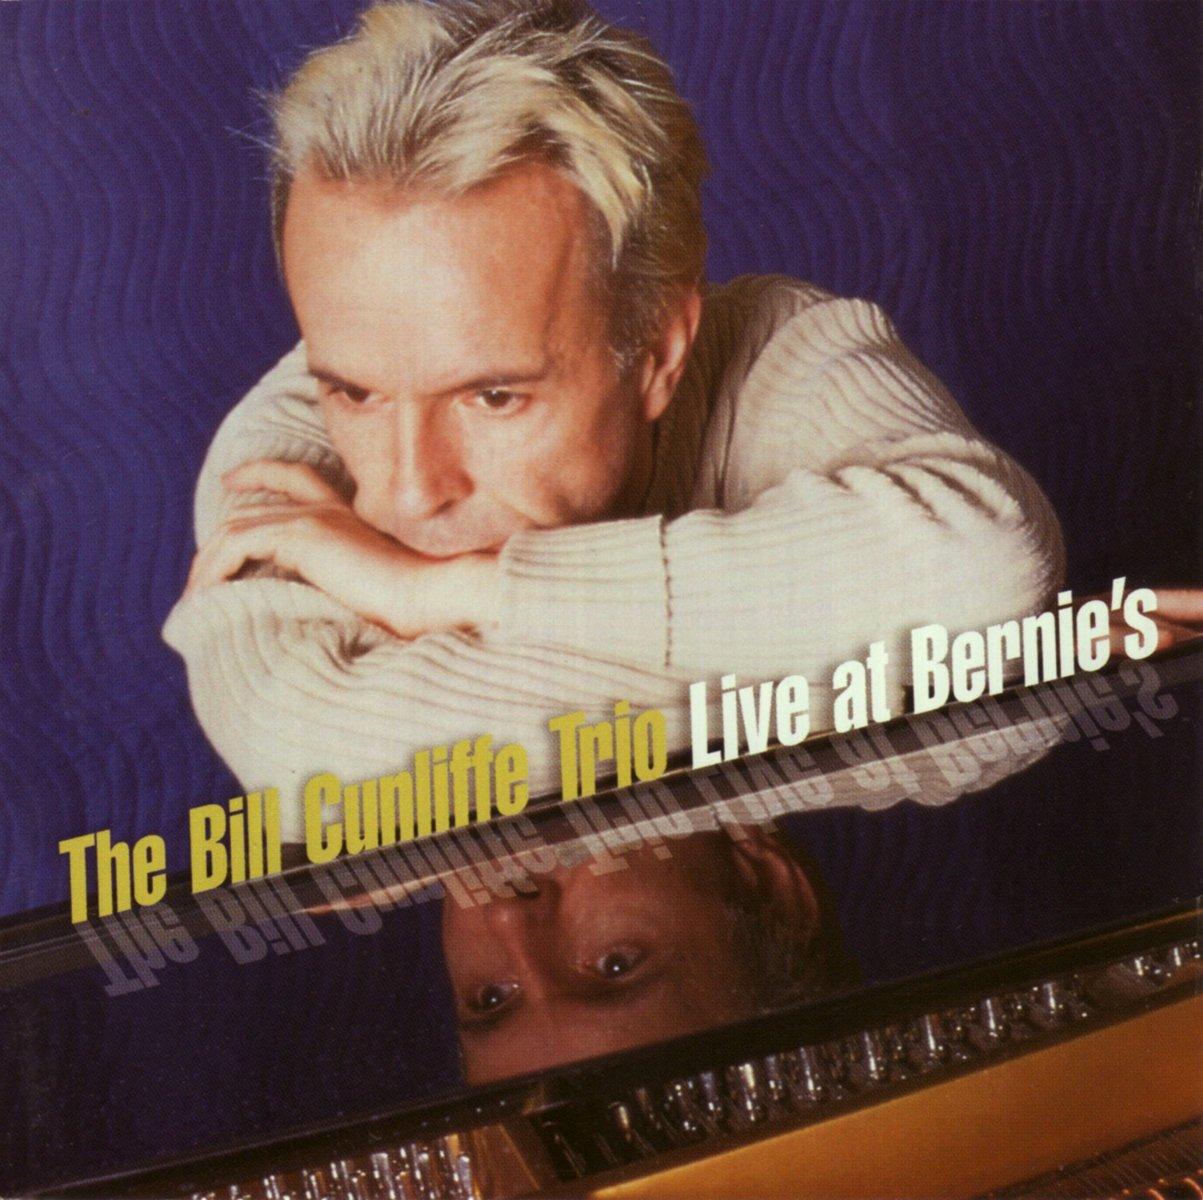 SACD : Bill Cunliffe - Live at Bernies (SACD)